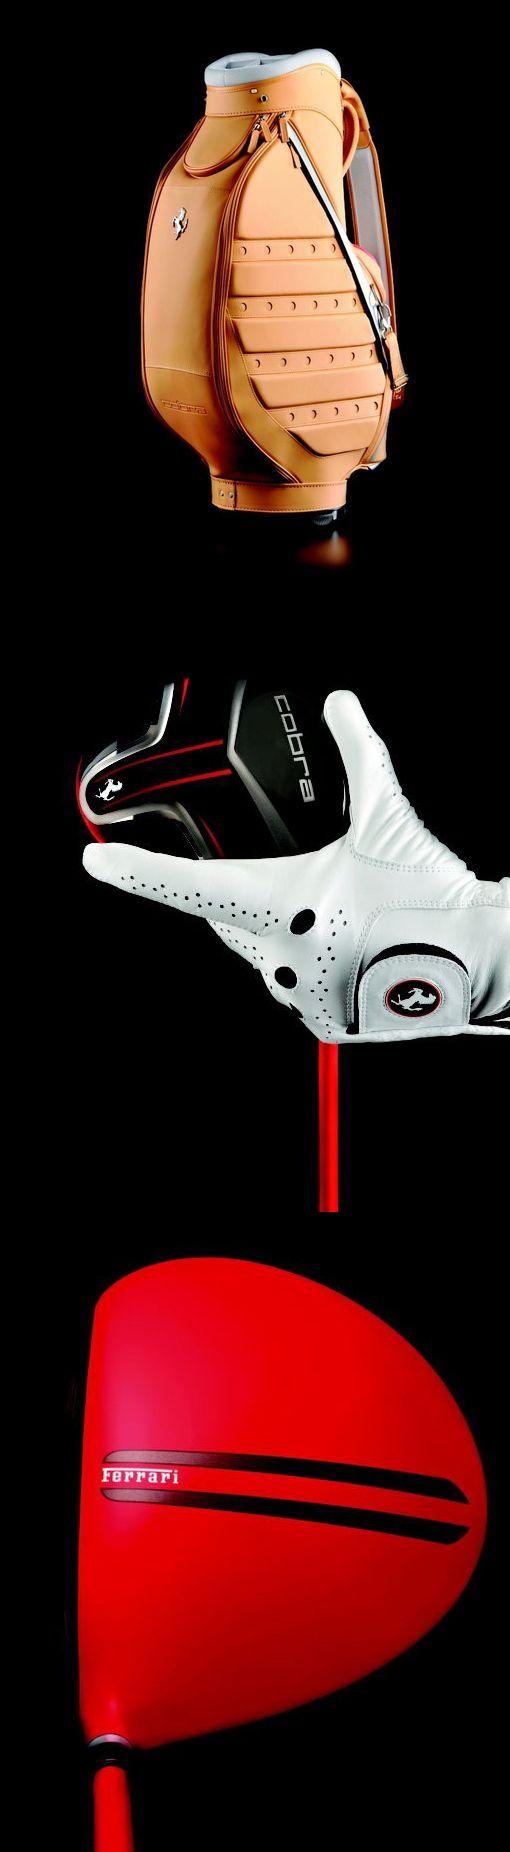 ♂ Man's fashion accessories Luxury Ferrari golf gear - Ferrari teams up with Cobra Puma Golf for special edition golf paraphernalia from http://luxurylaunches.com/fashion/ferrari_teams_up_with_cobra_puma_golf_for_special_edition_golf_paraphernalia.php